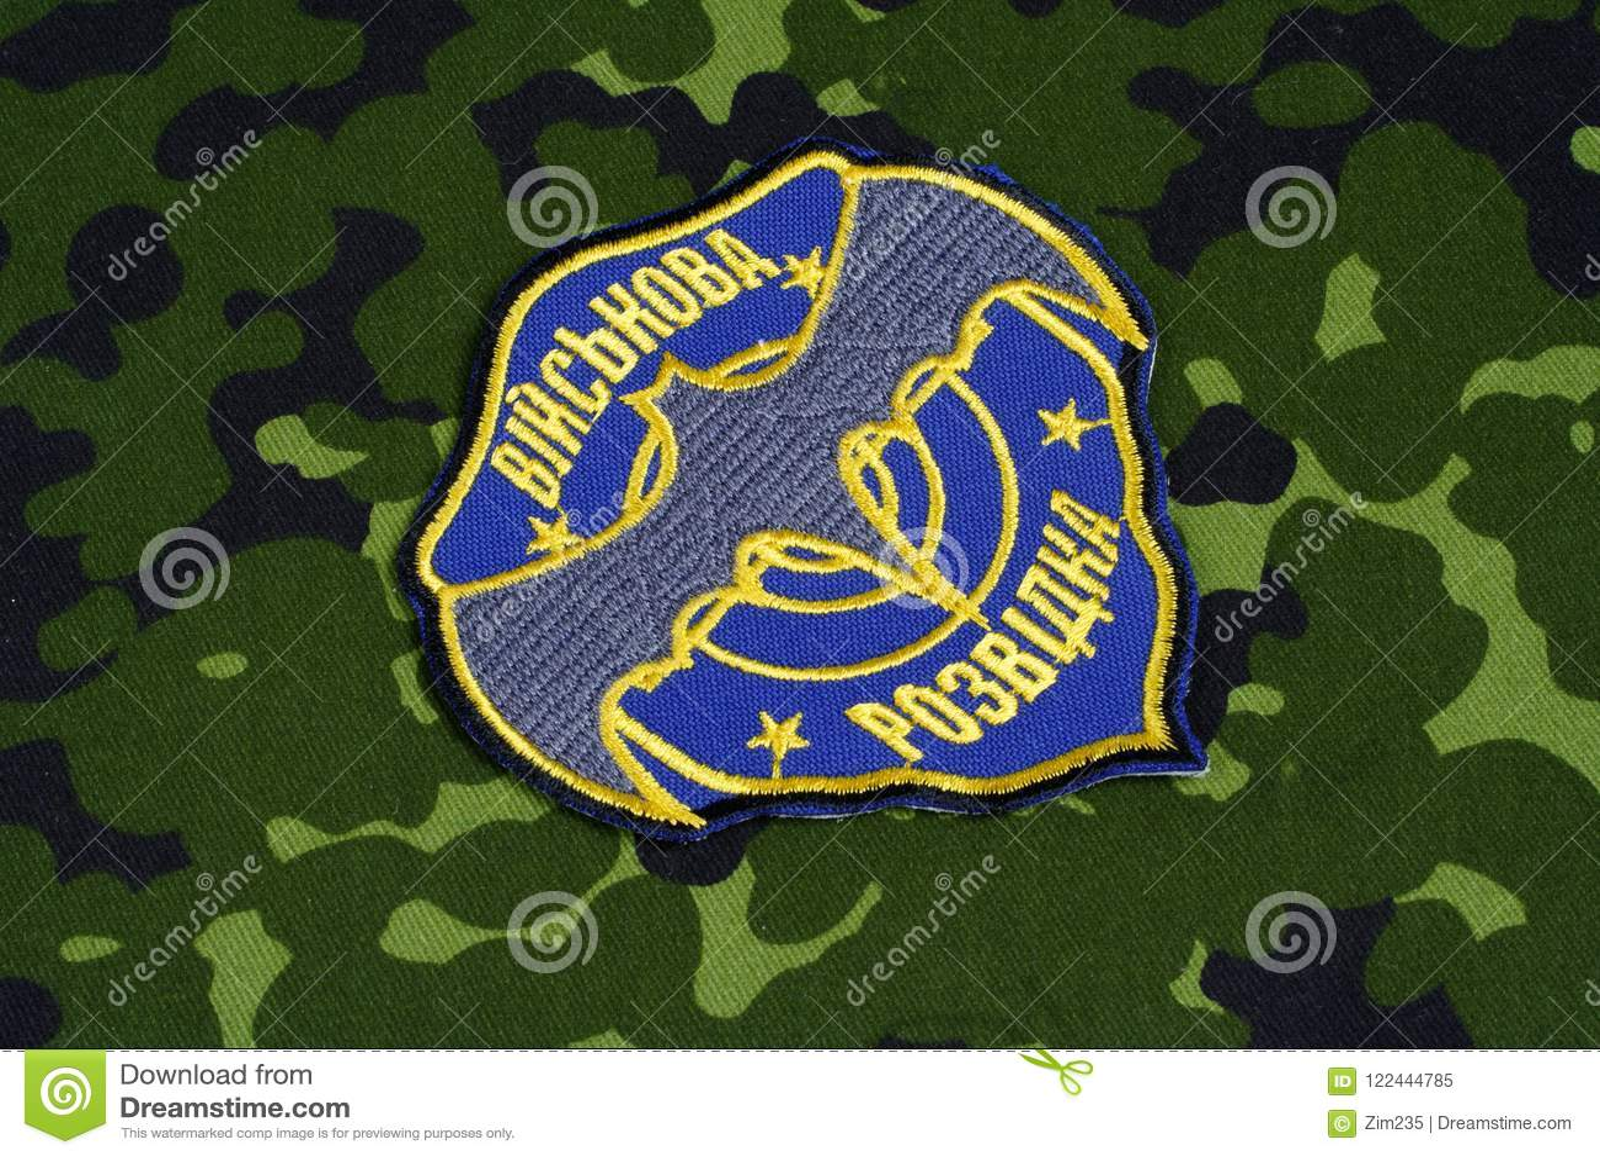 KYIV, UKRAINE - July, 16, 2015. Ukraine s military intelligence uniform badge